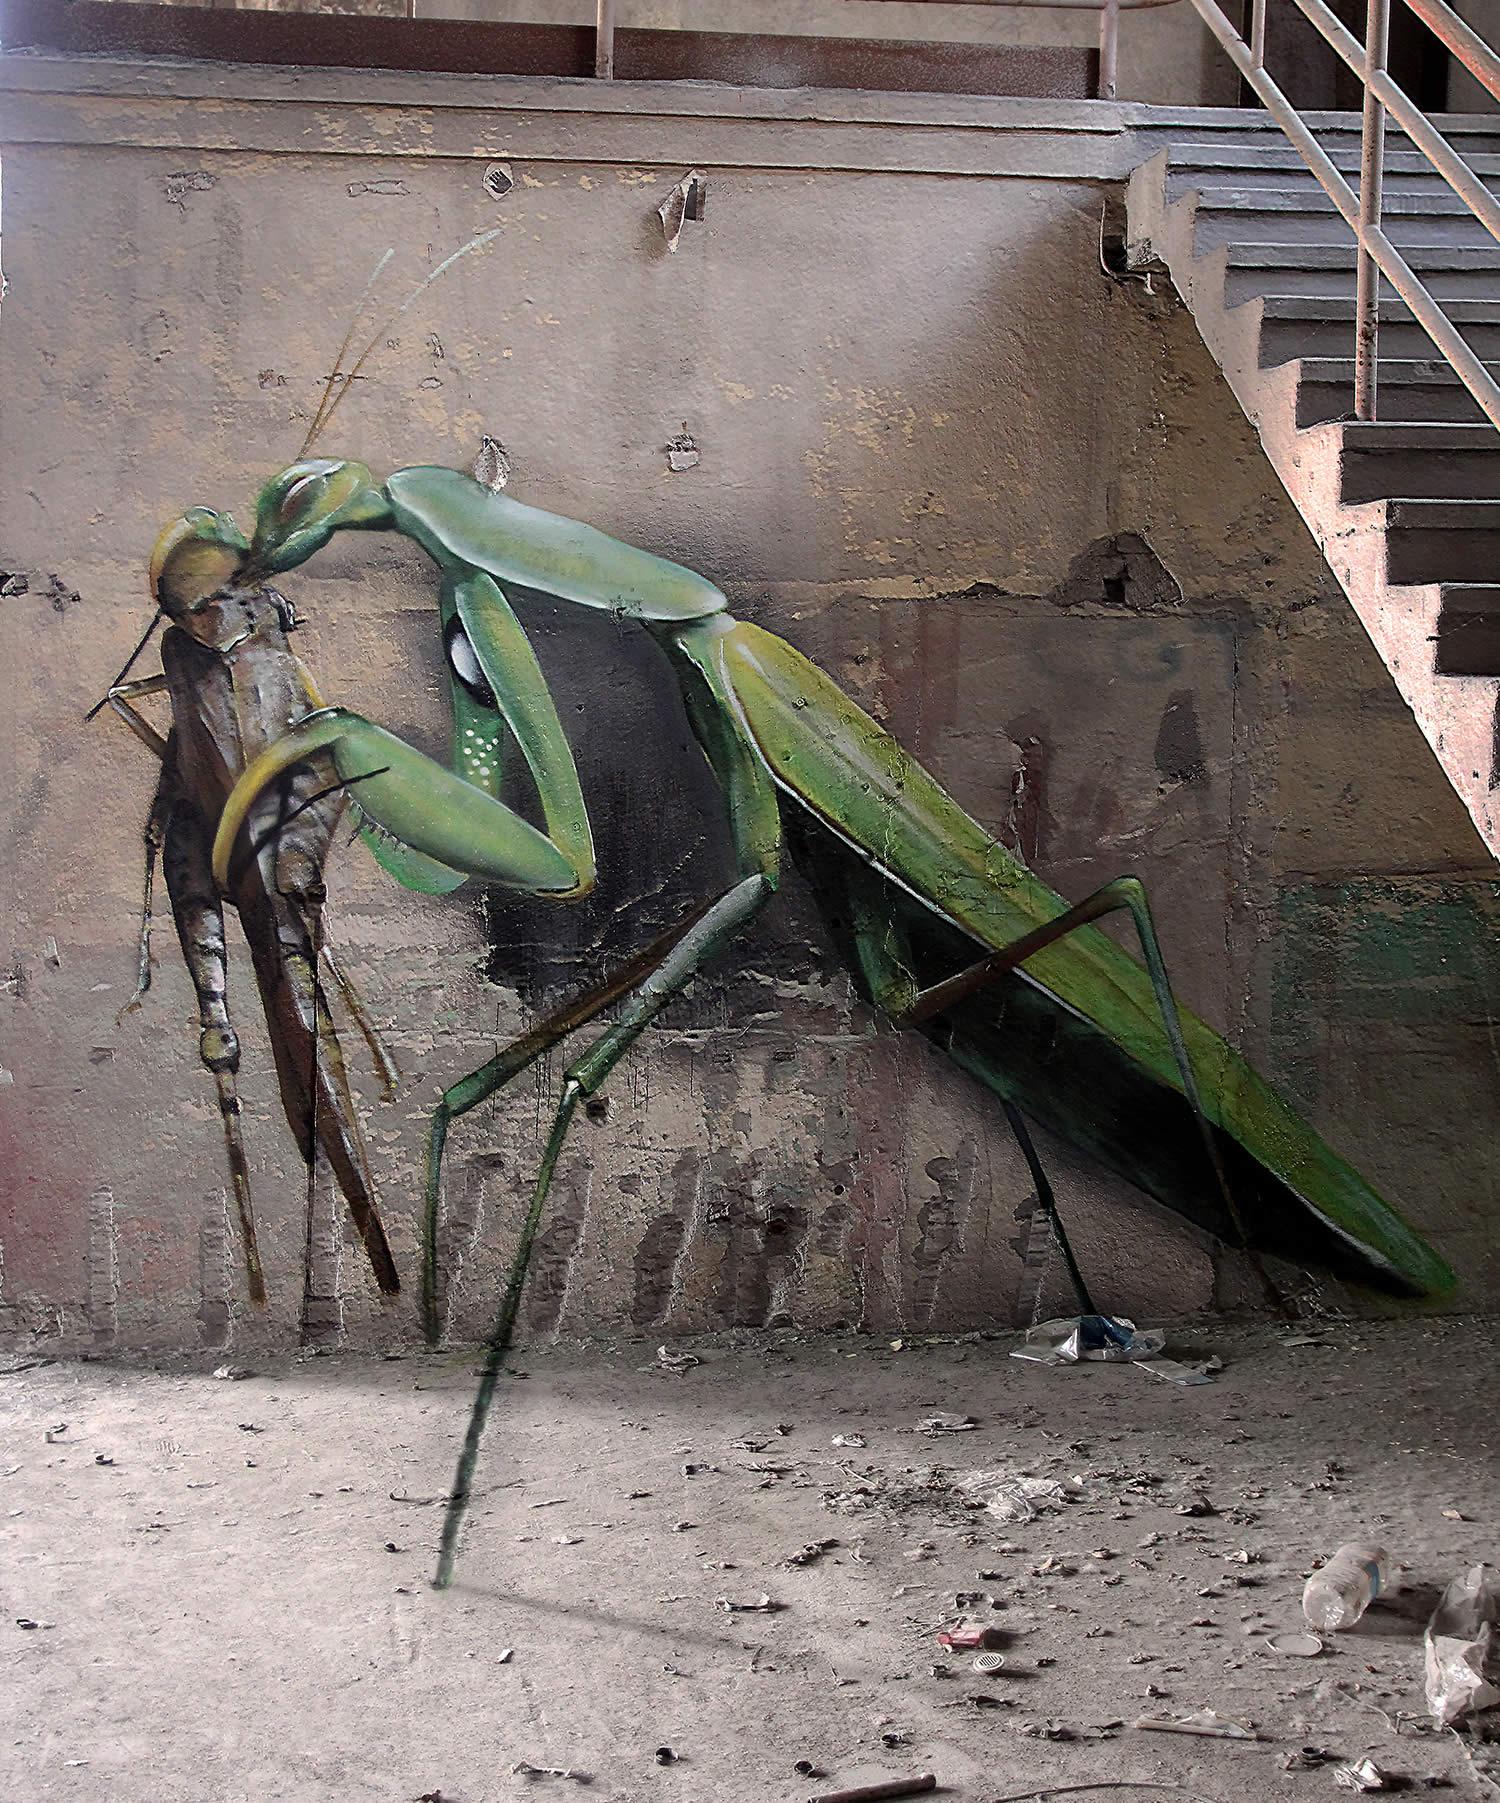 grasshopper, graffiti by mantra rea